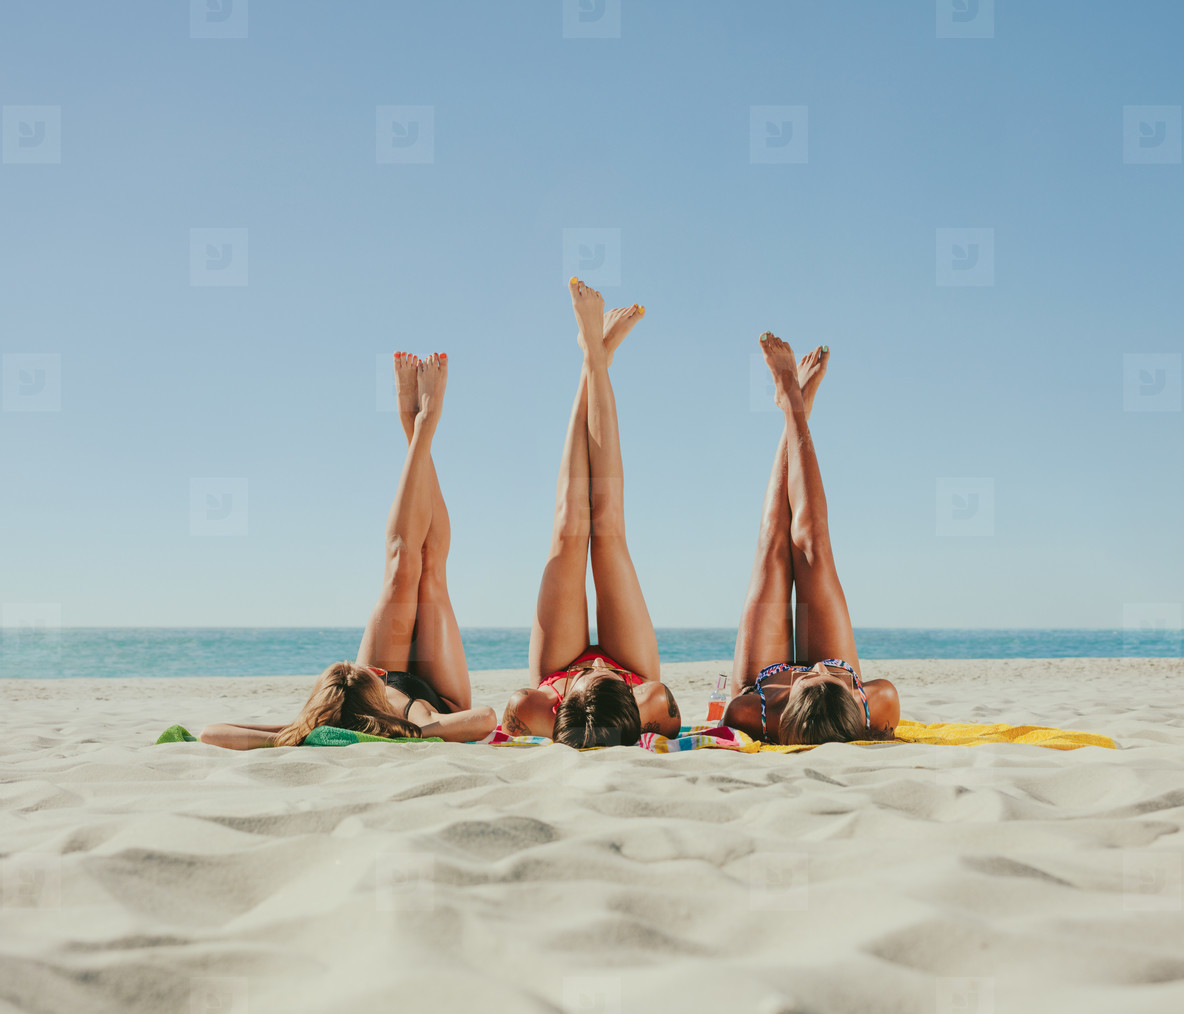 Photos - Woman In Bikini Sunbathing On Beach With Legs -6078